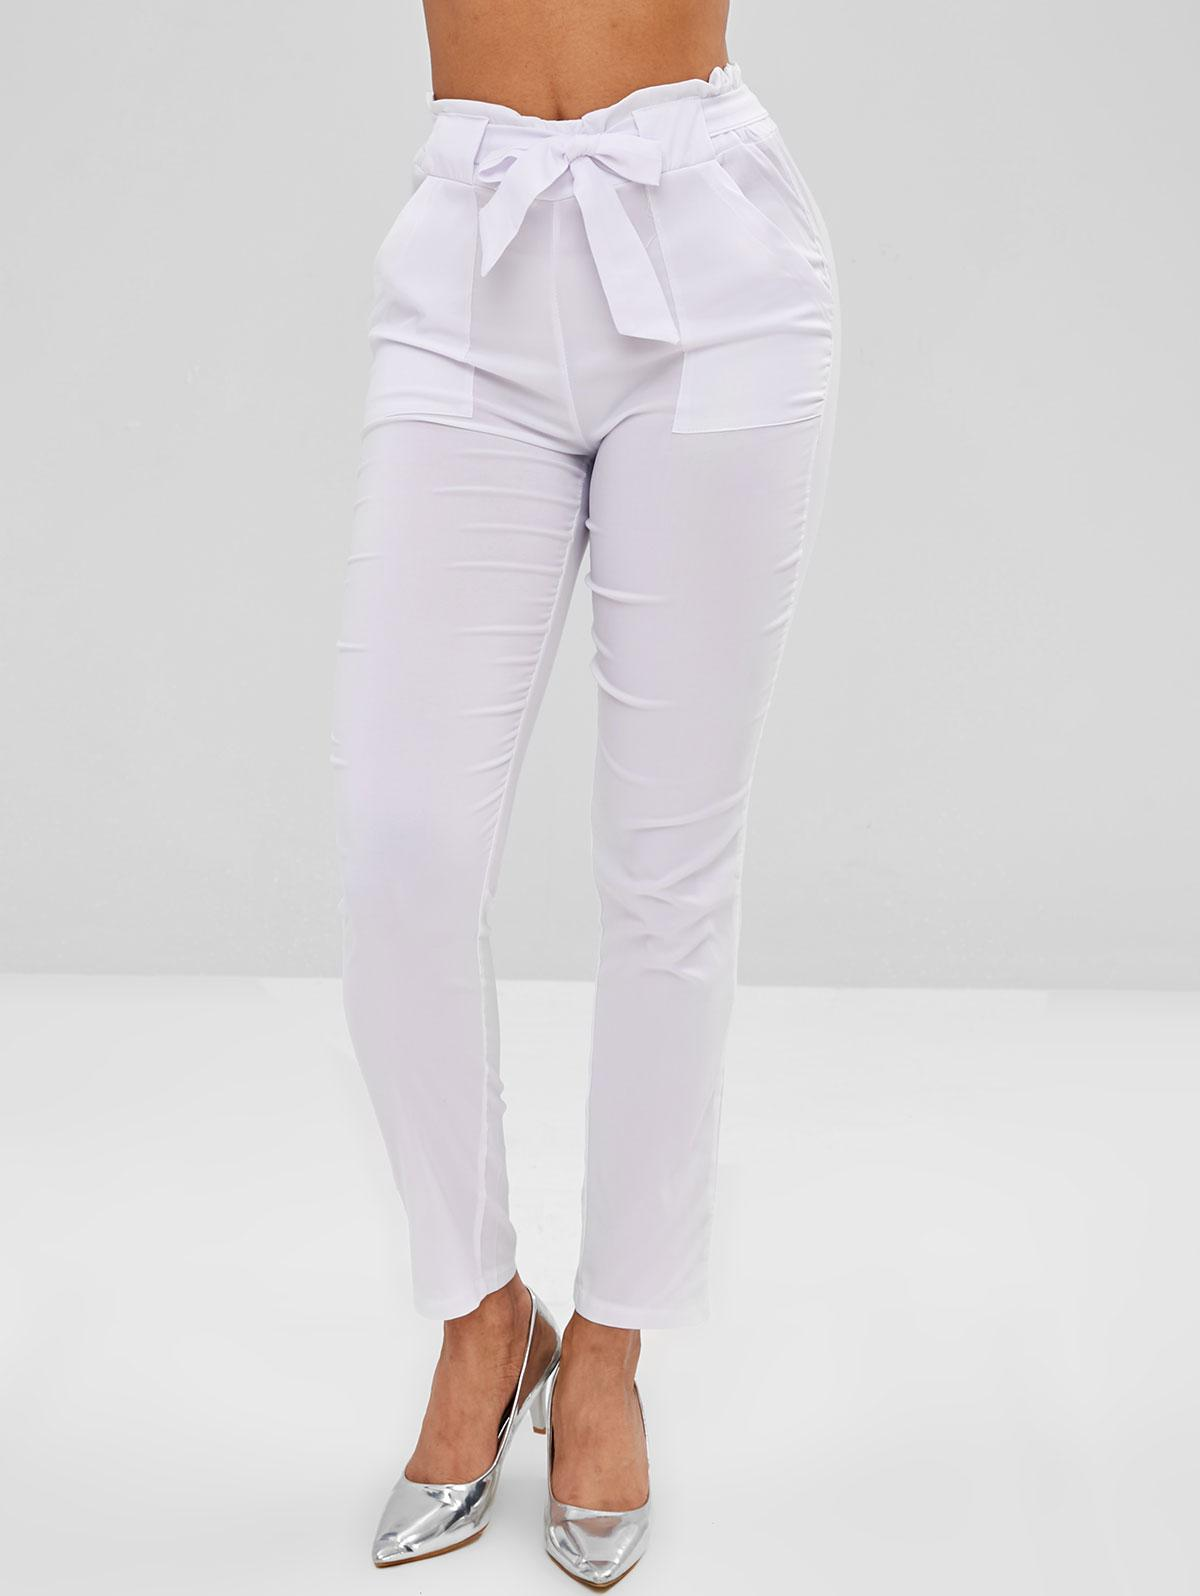 Pockets Straight High Waisted Pants, White